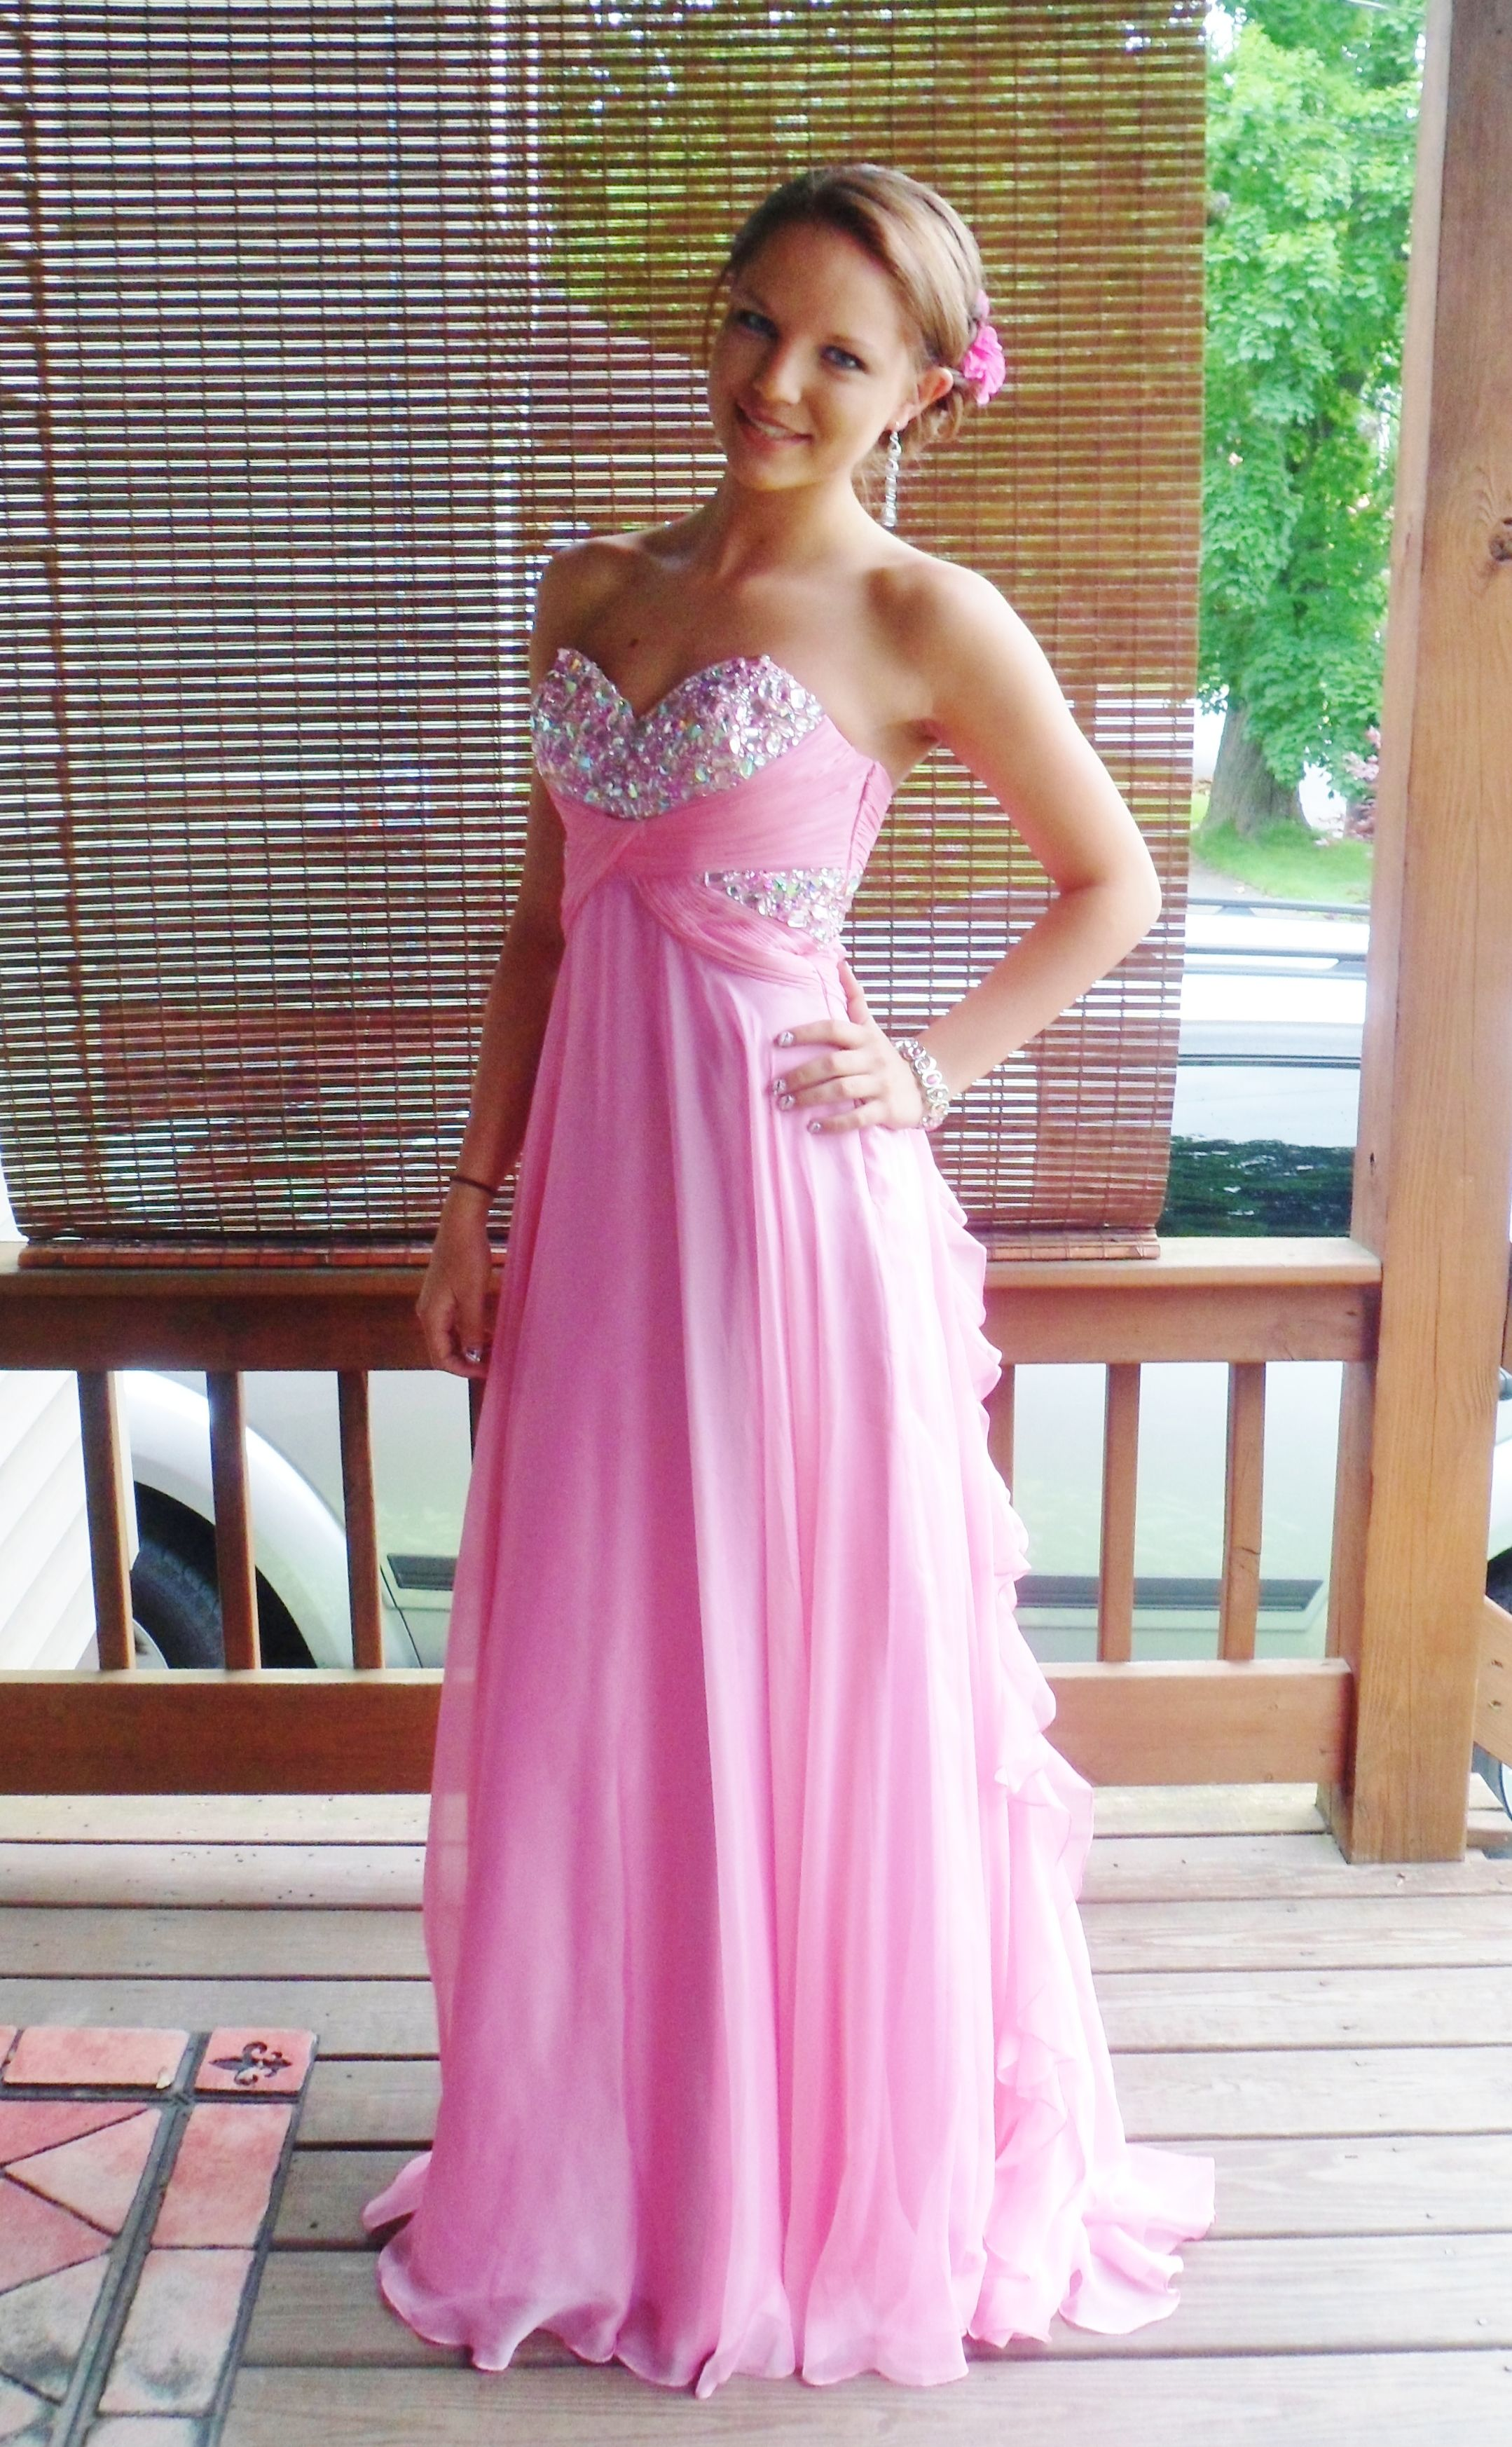 Pin de Taylor Hile en Pink Prom | Pinterest | Vestidos de fiesta ...